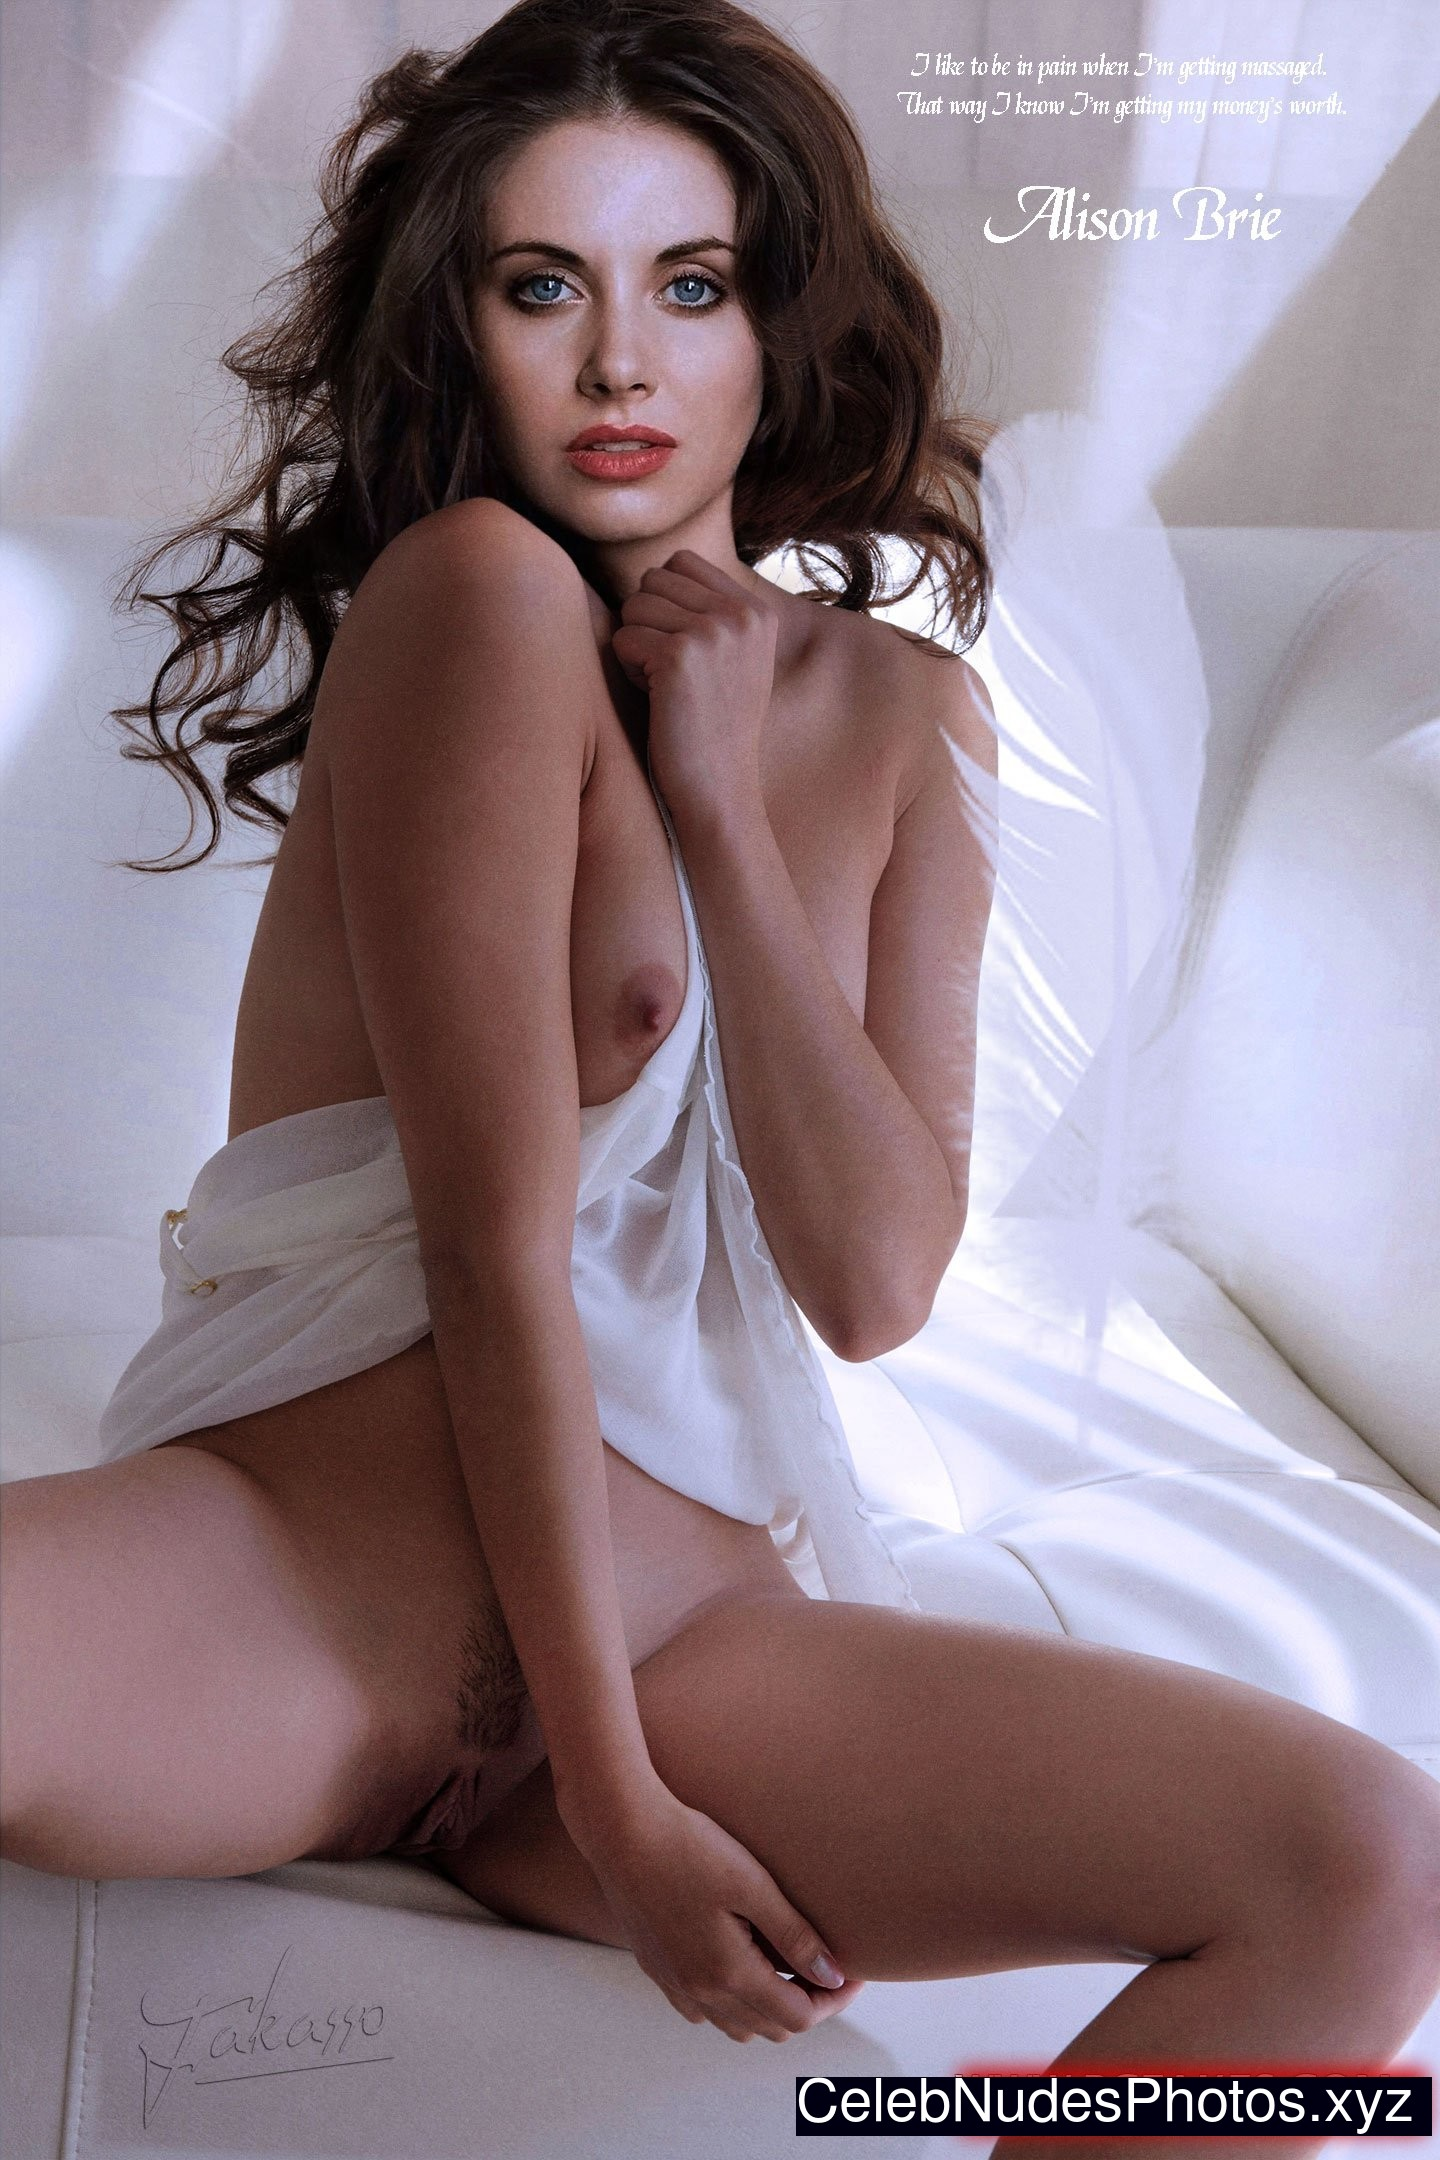 Alison Brie Nude Celebrity Picture sexy 12